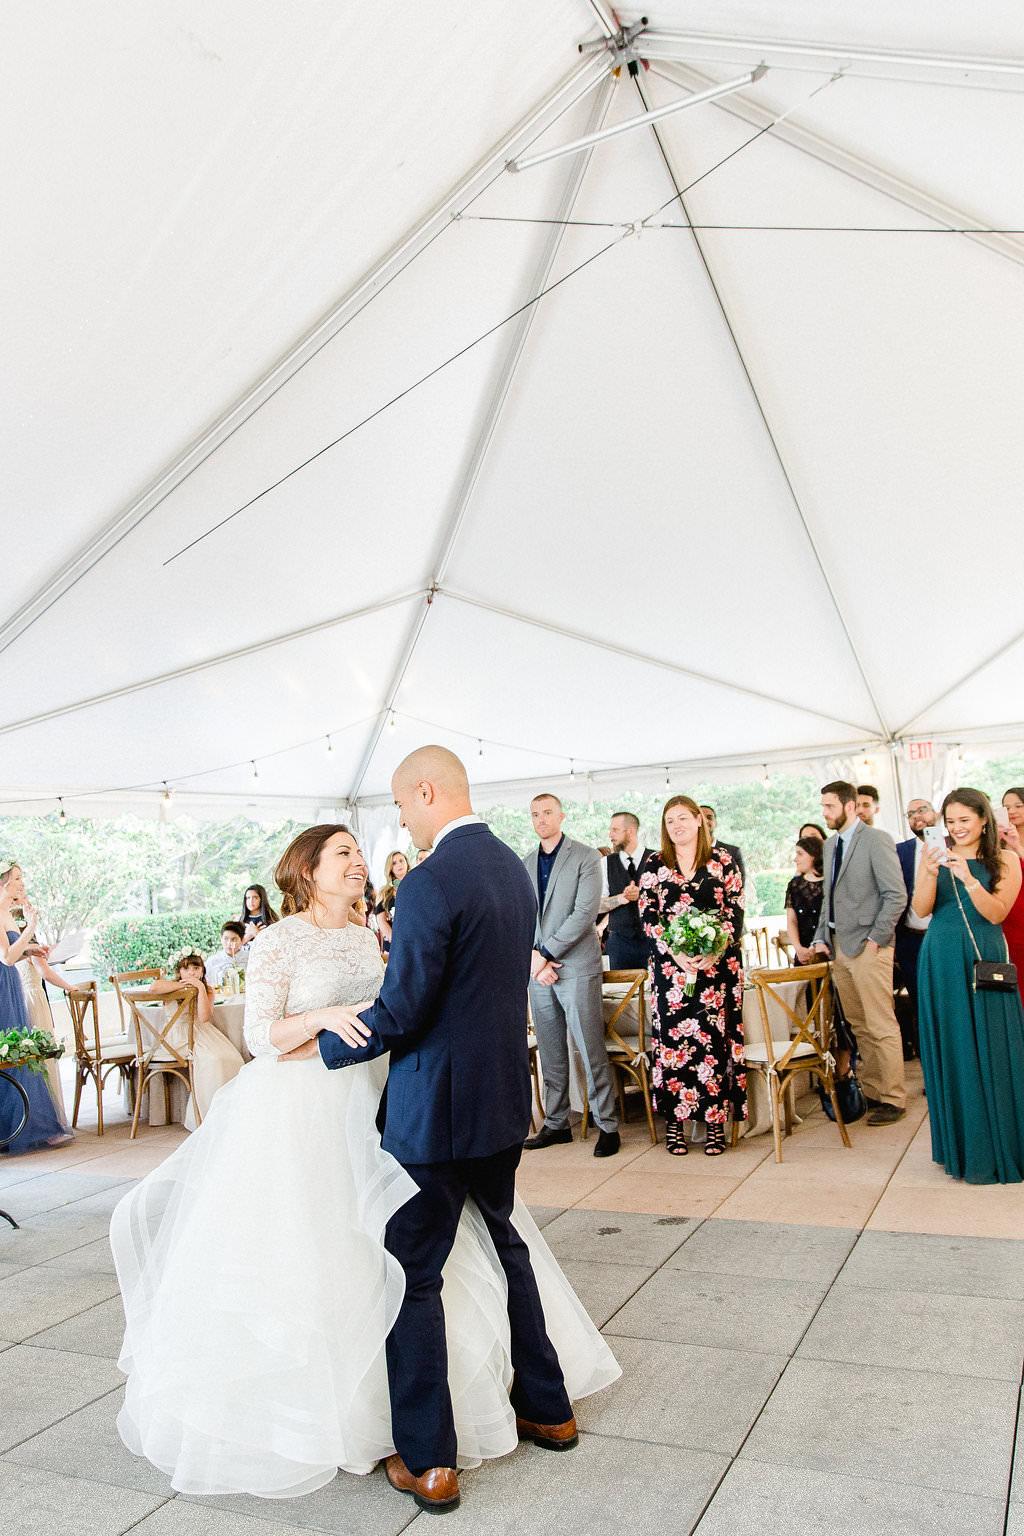 Bride and Groom Wedding Reception First Dance Portrait | South Tampa Wedding Venue Epicurean Hotel